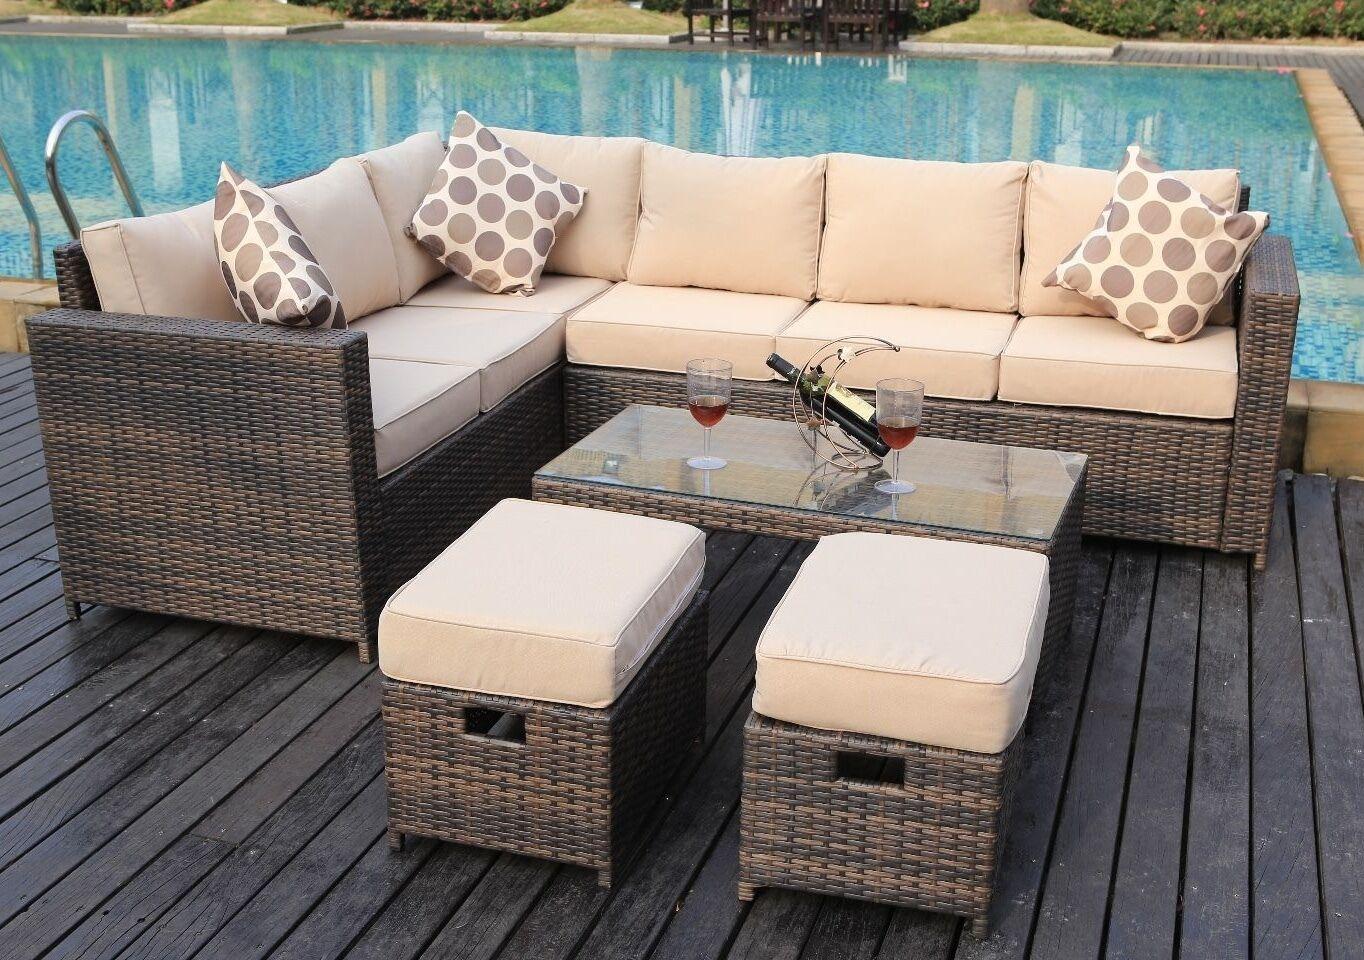 Garden Furniture - NEW Conservatory MODULAR 8 Seater Rattan Corner Sofa Set Garden Furniture brown